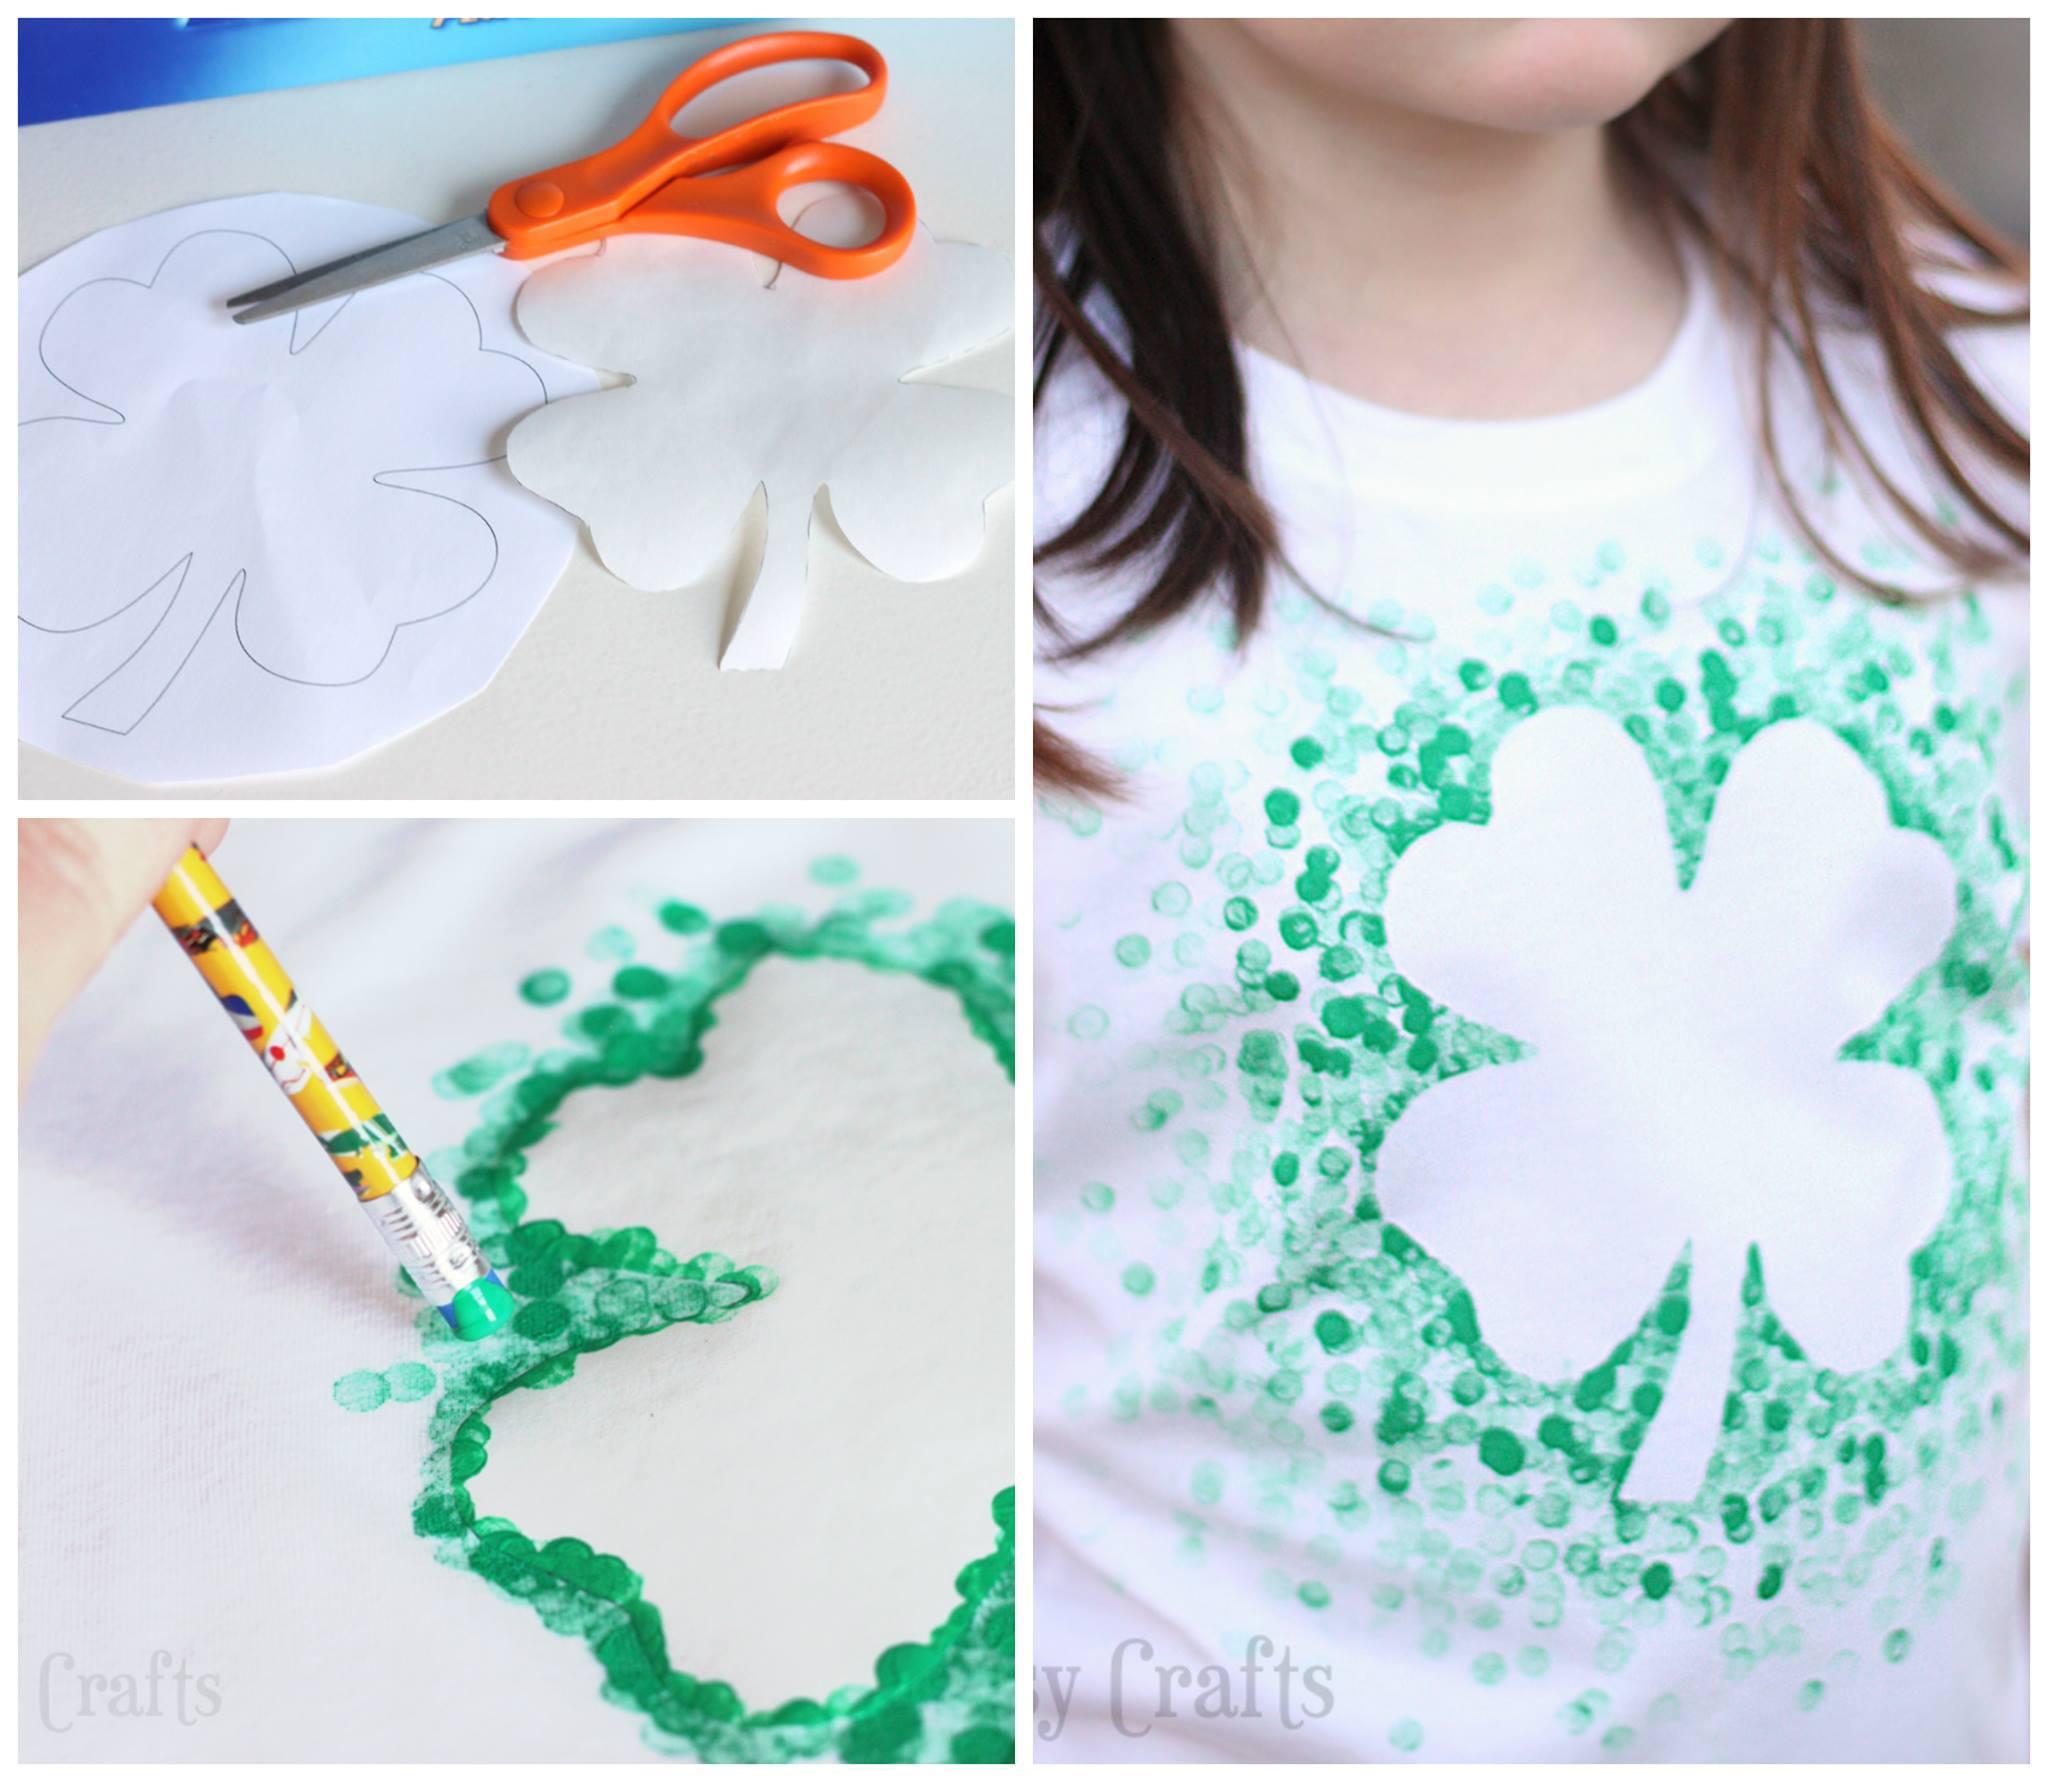 DIY Eraser-Stamped St. Patrick's Day Shirt